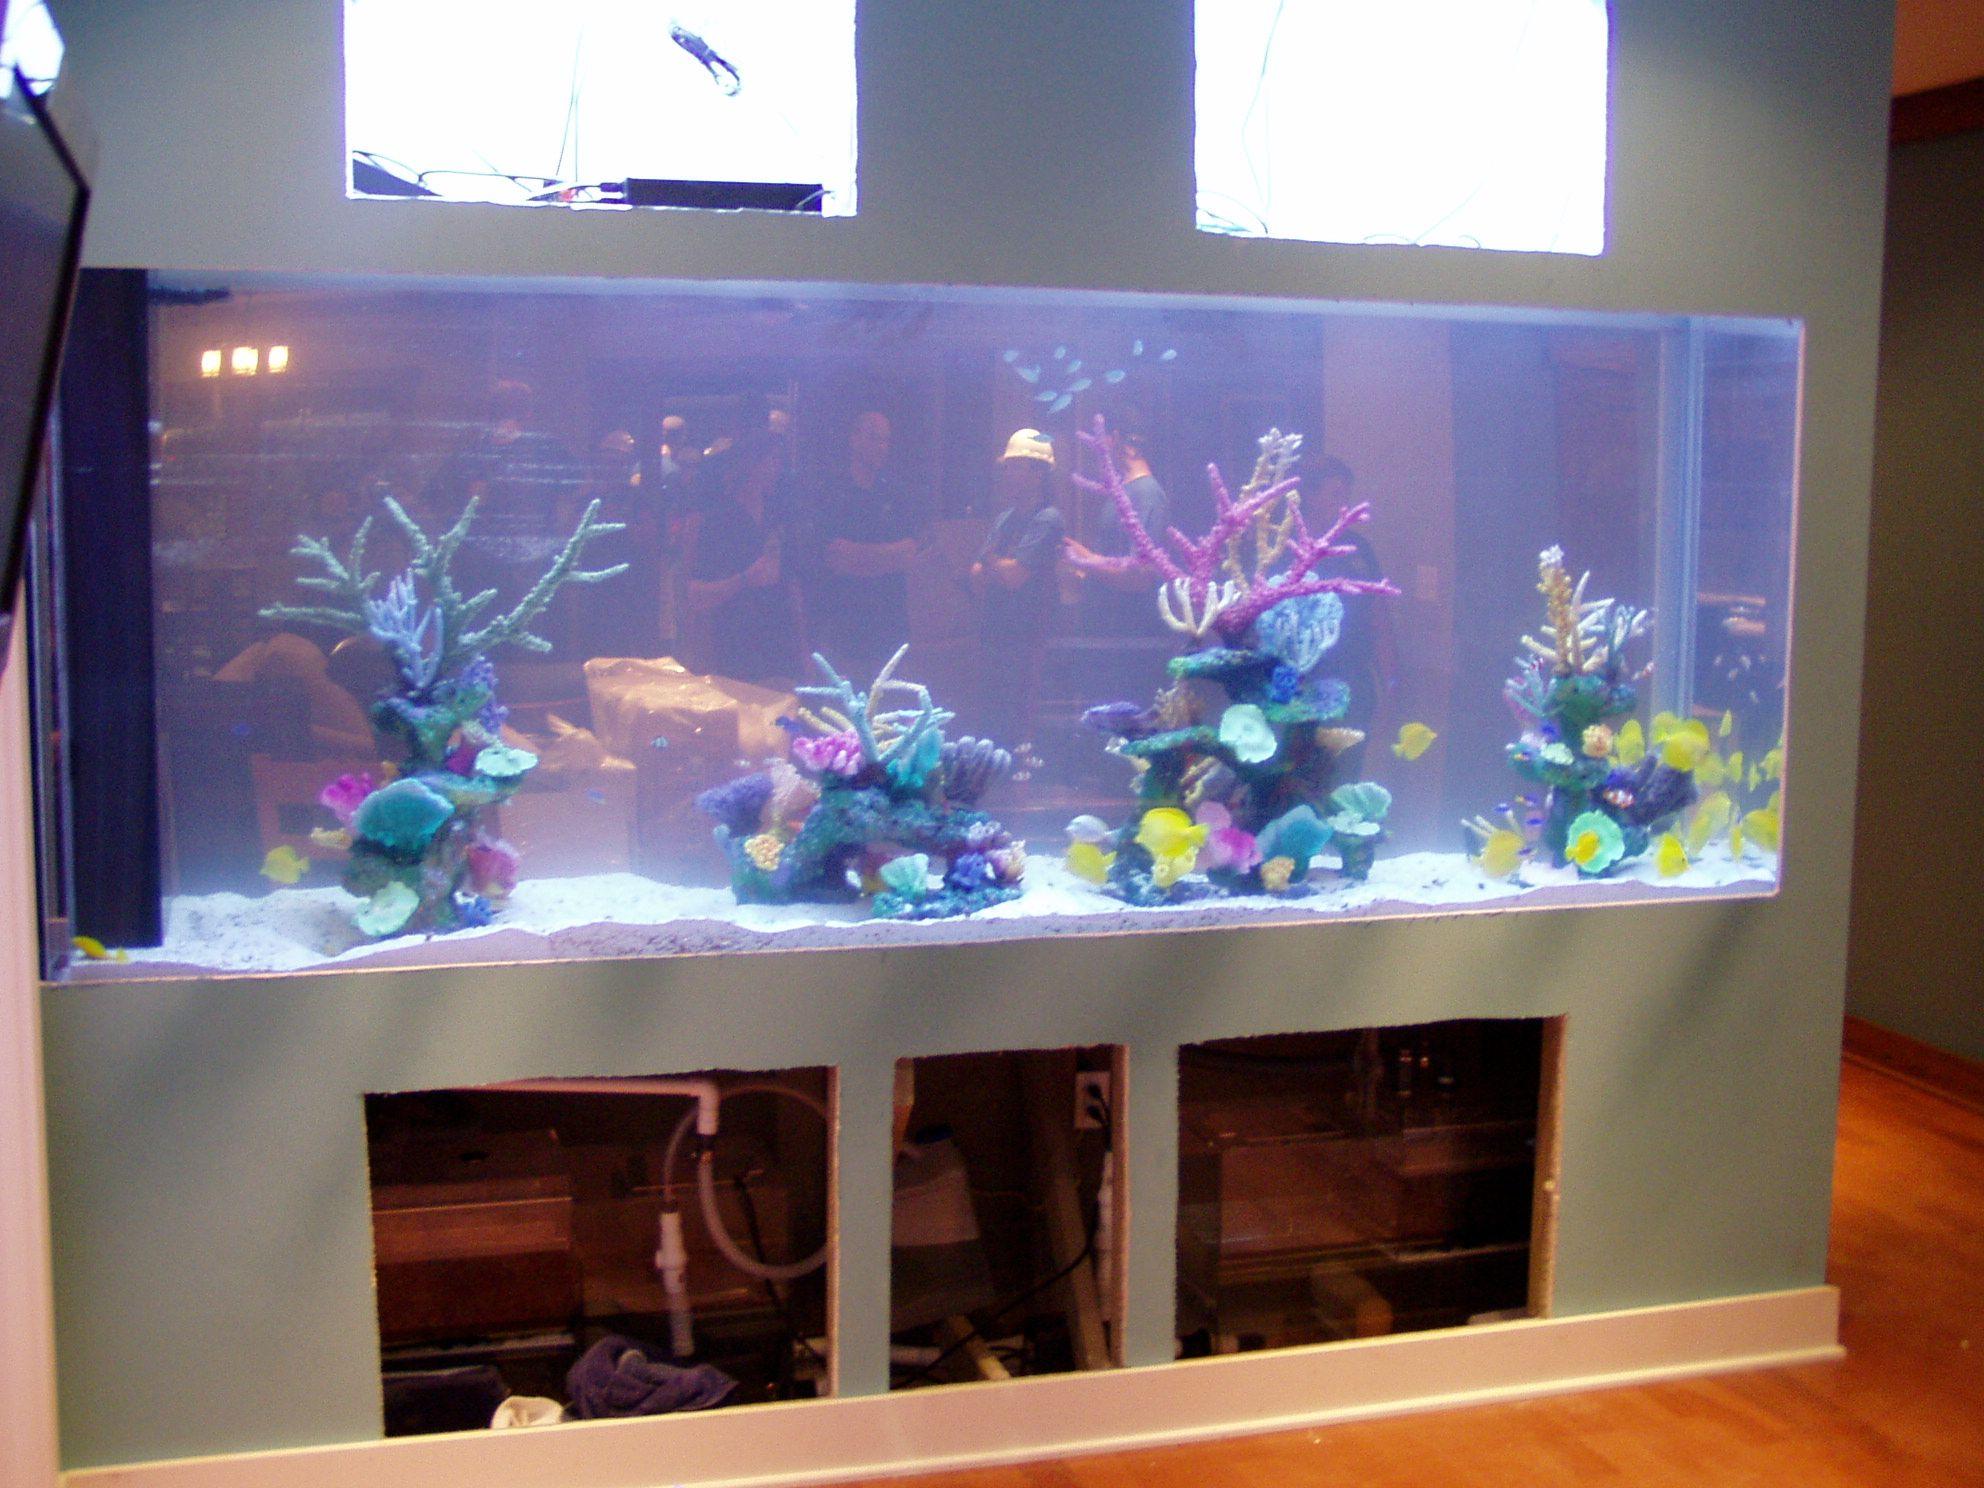 Built In Aquarium Fish Tank Wall Aquarium Fish Tanked Aquariums